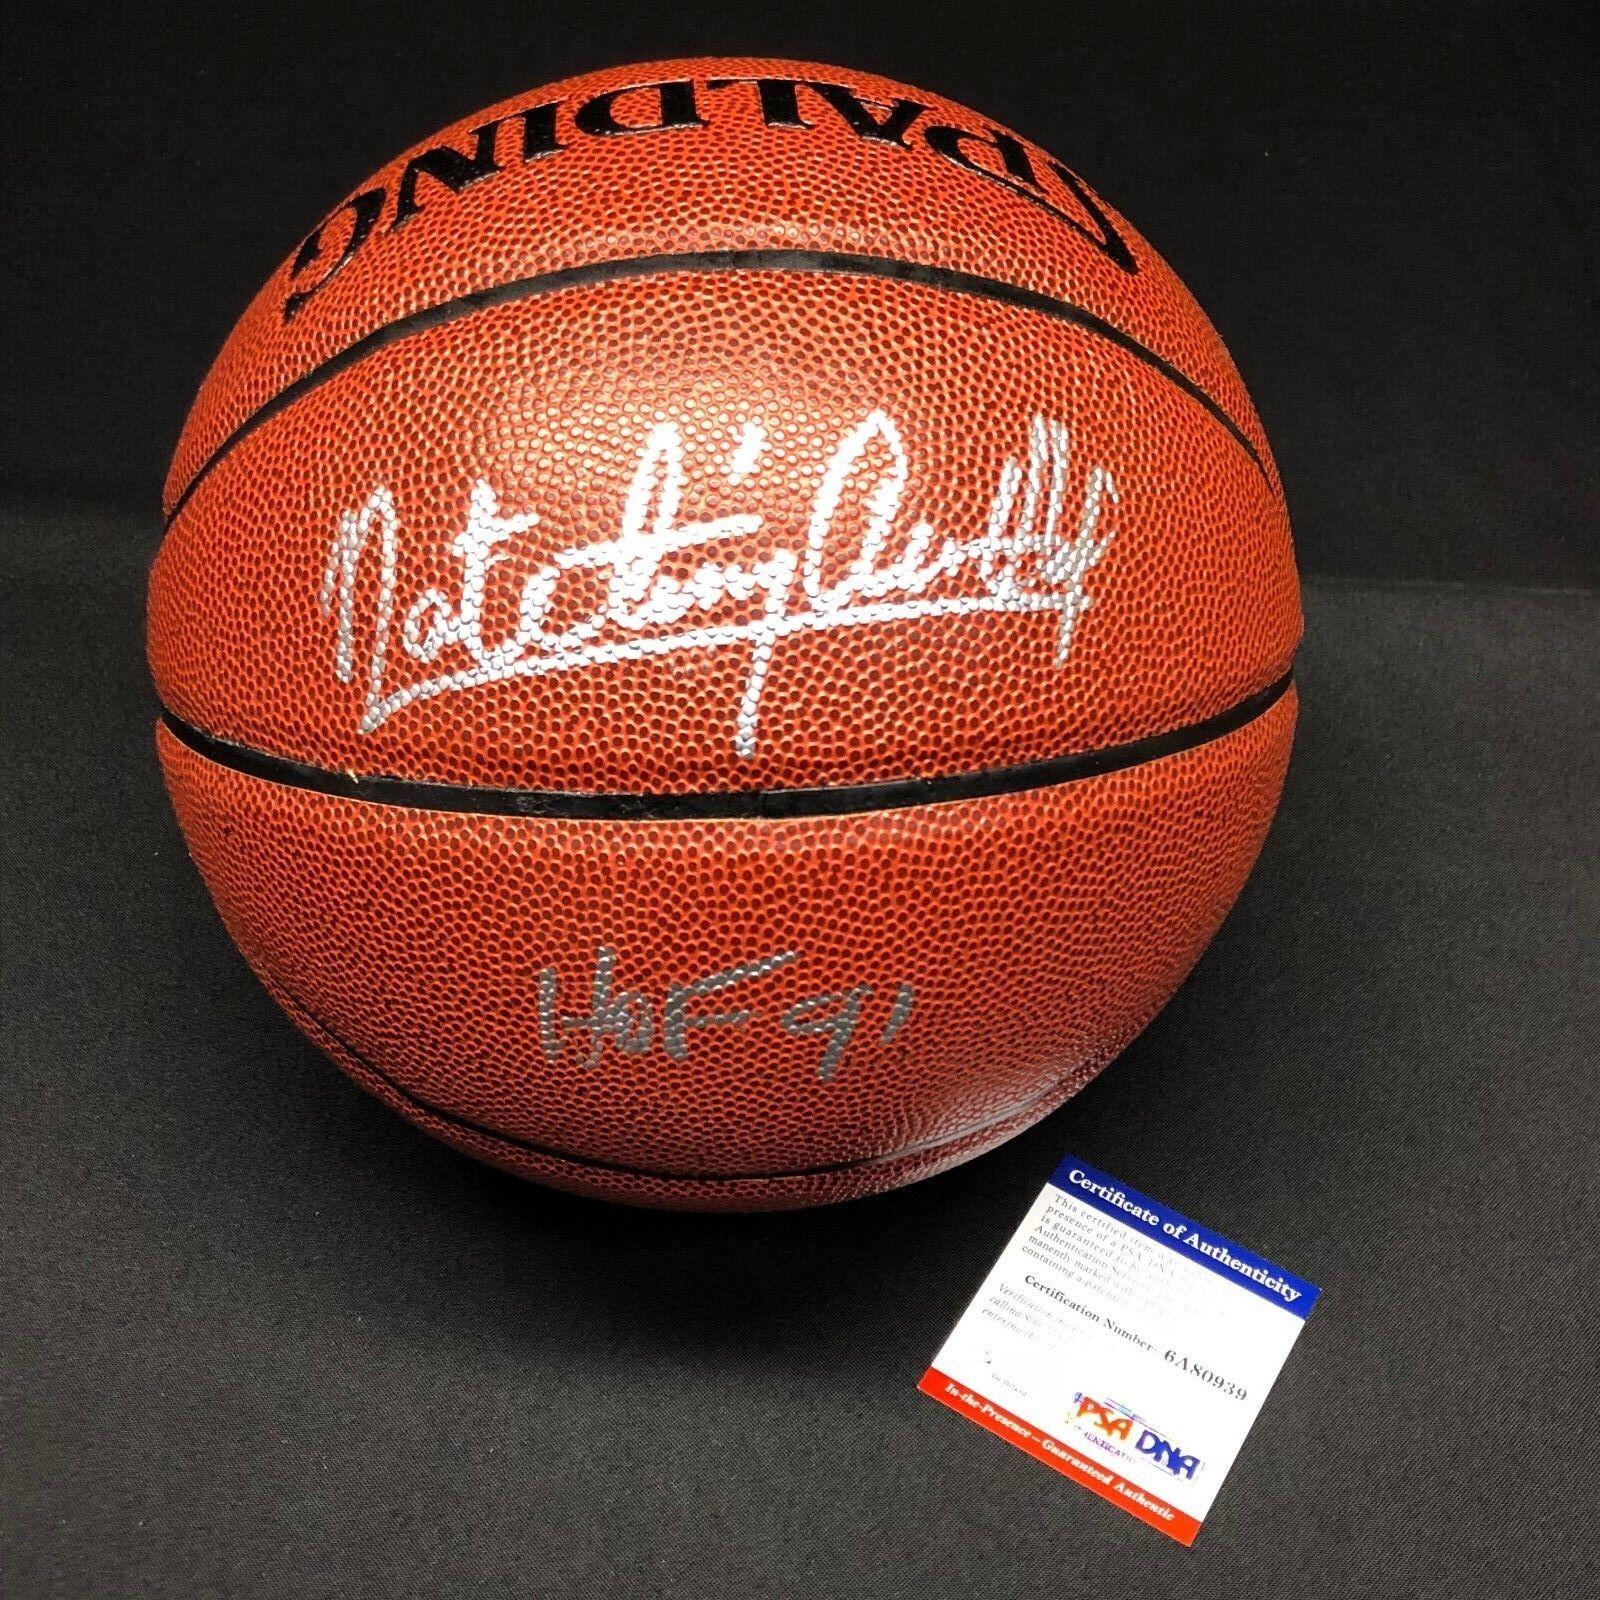 Nate Tiny Archibald Signed I/O Basketball